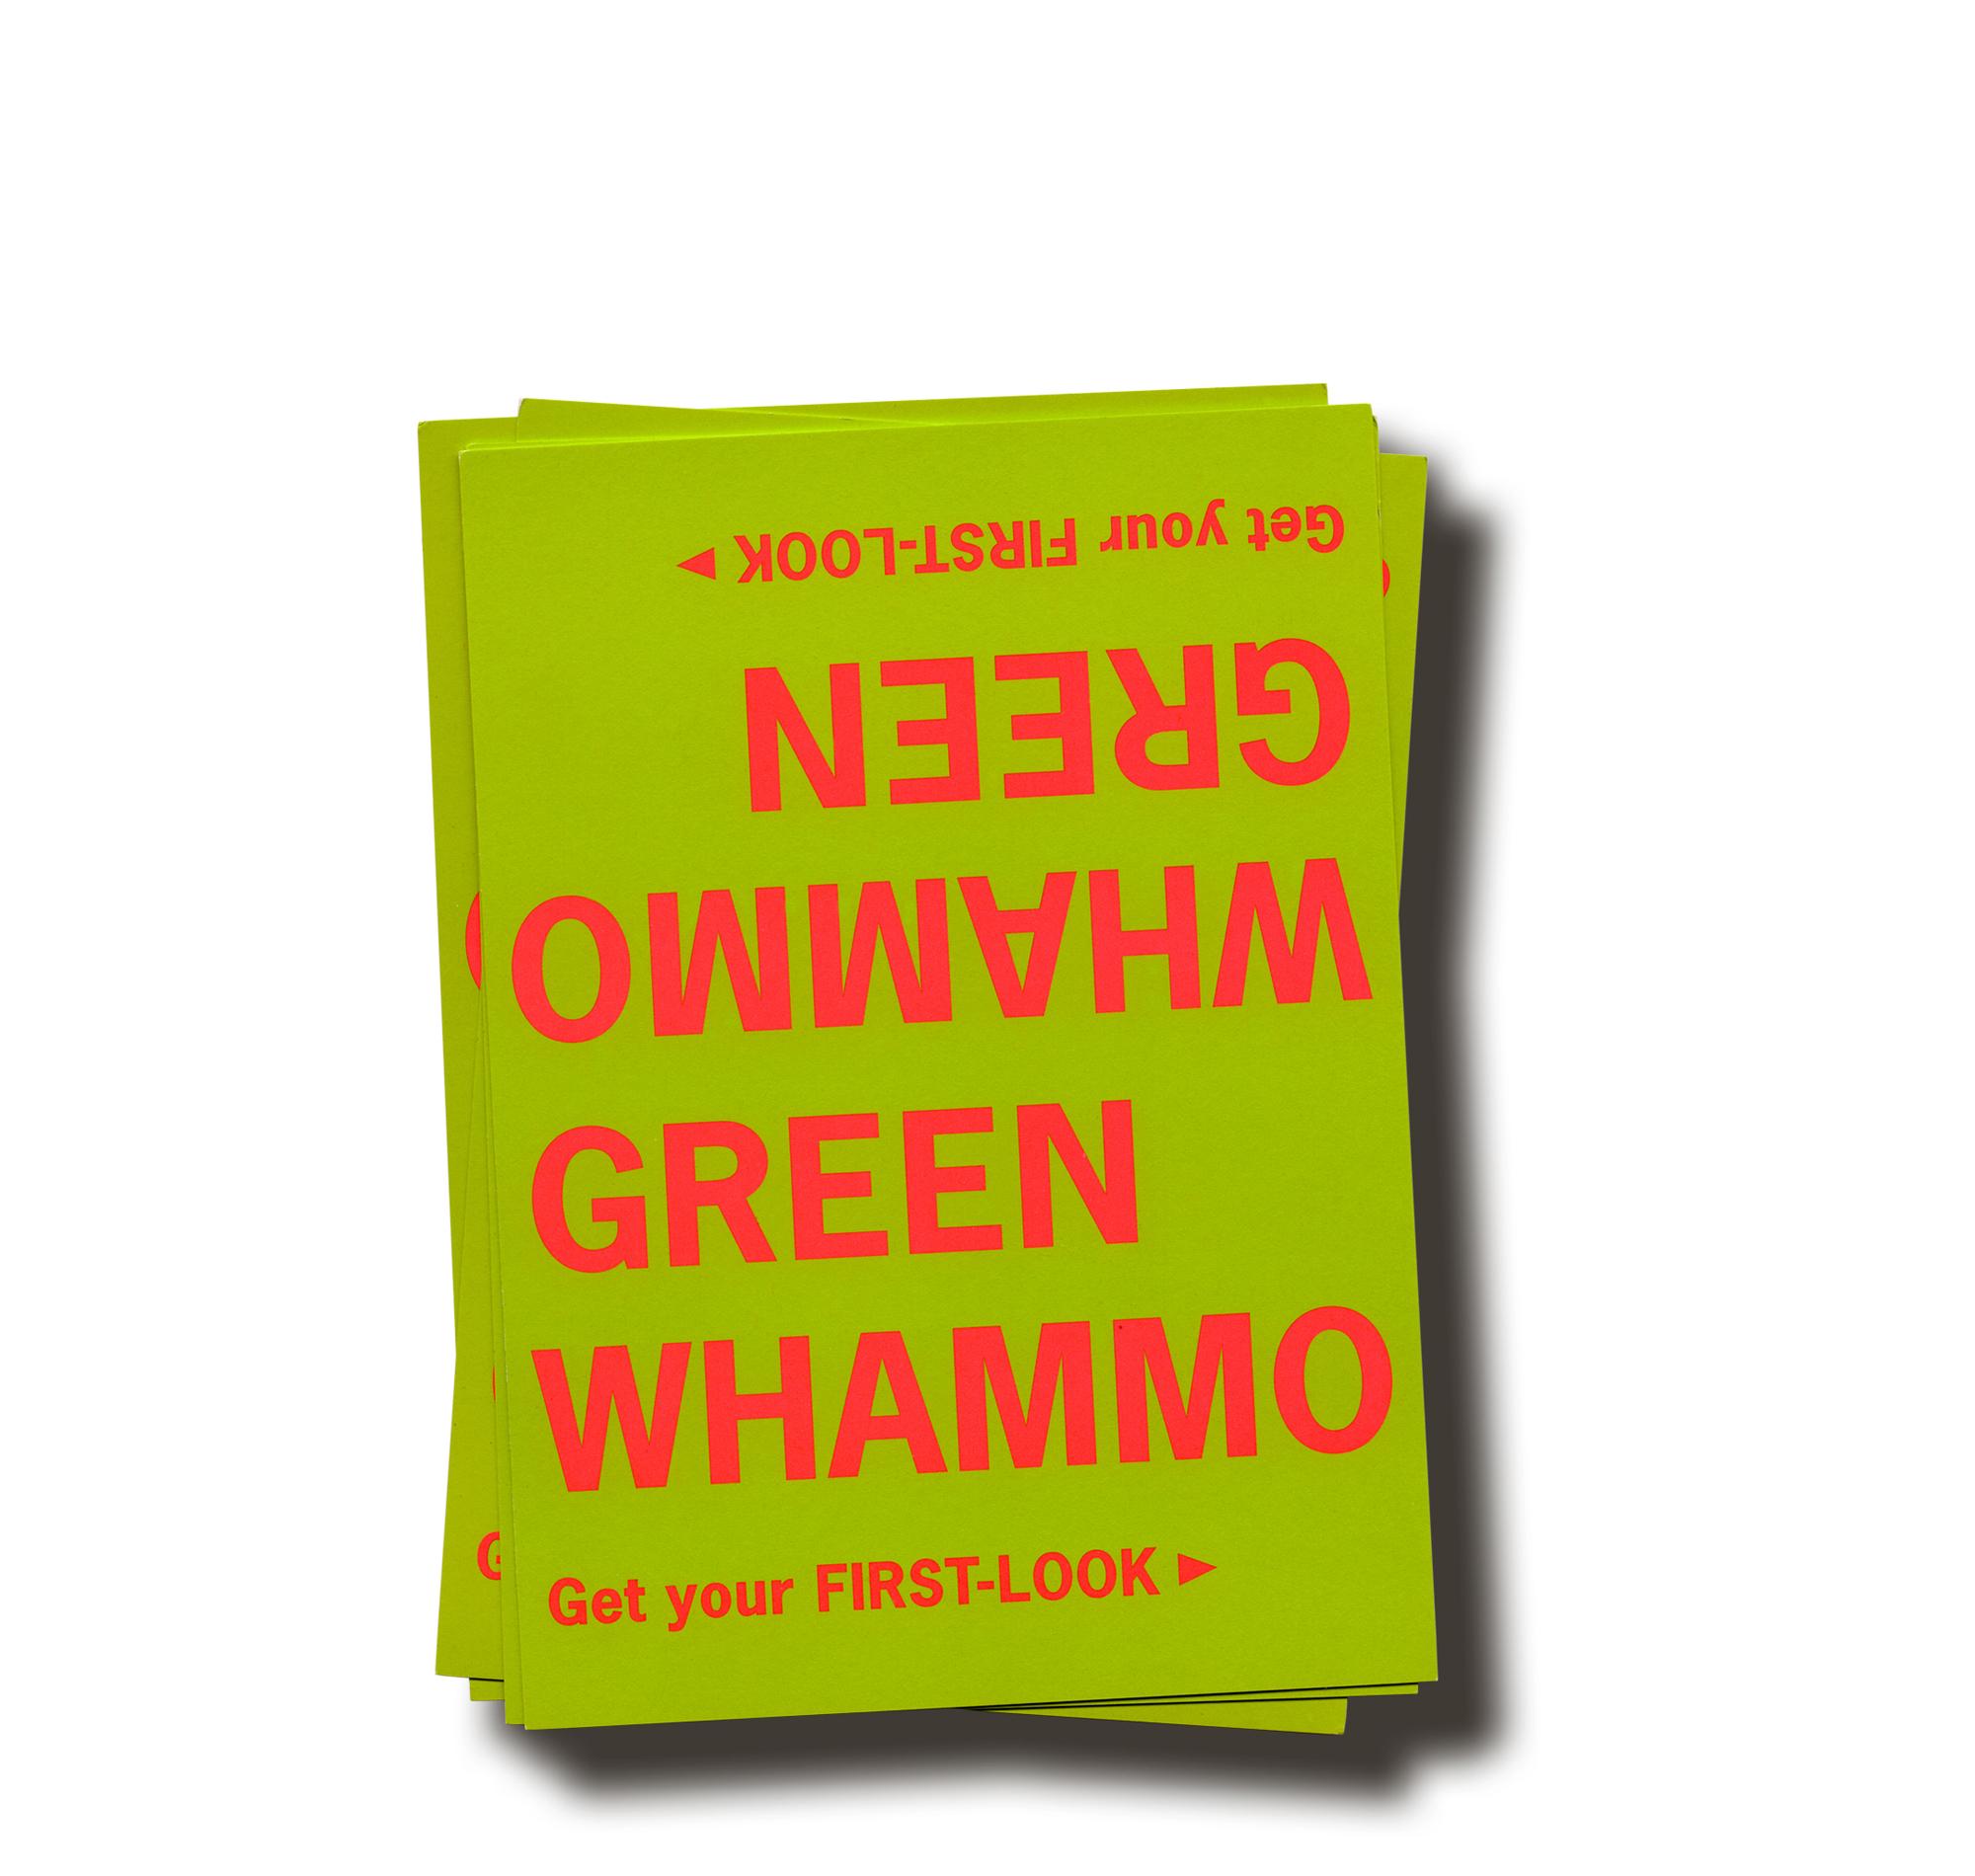 greencode_1